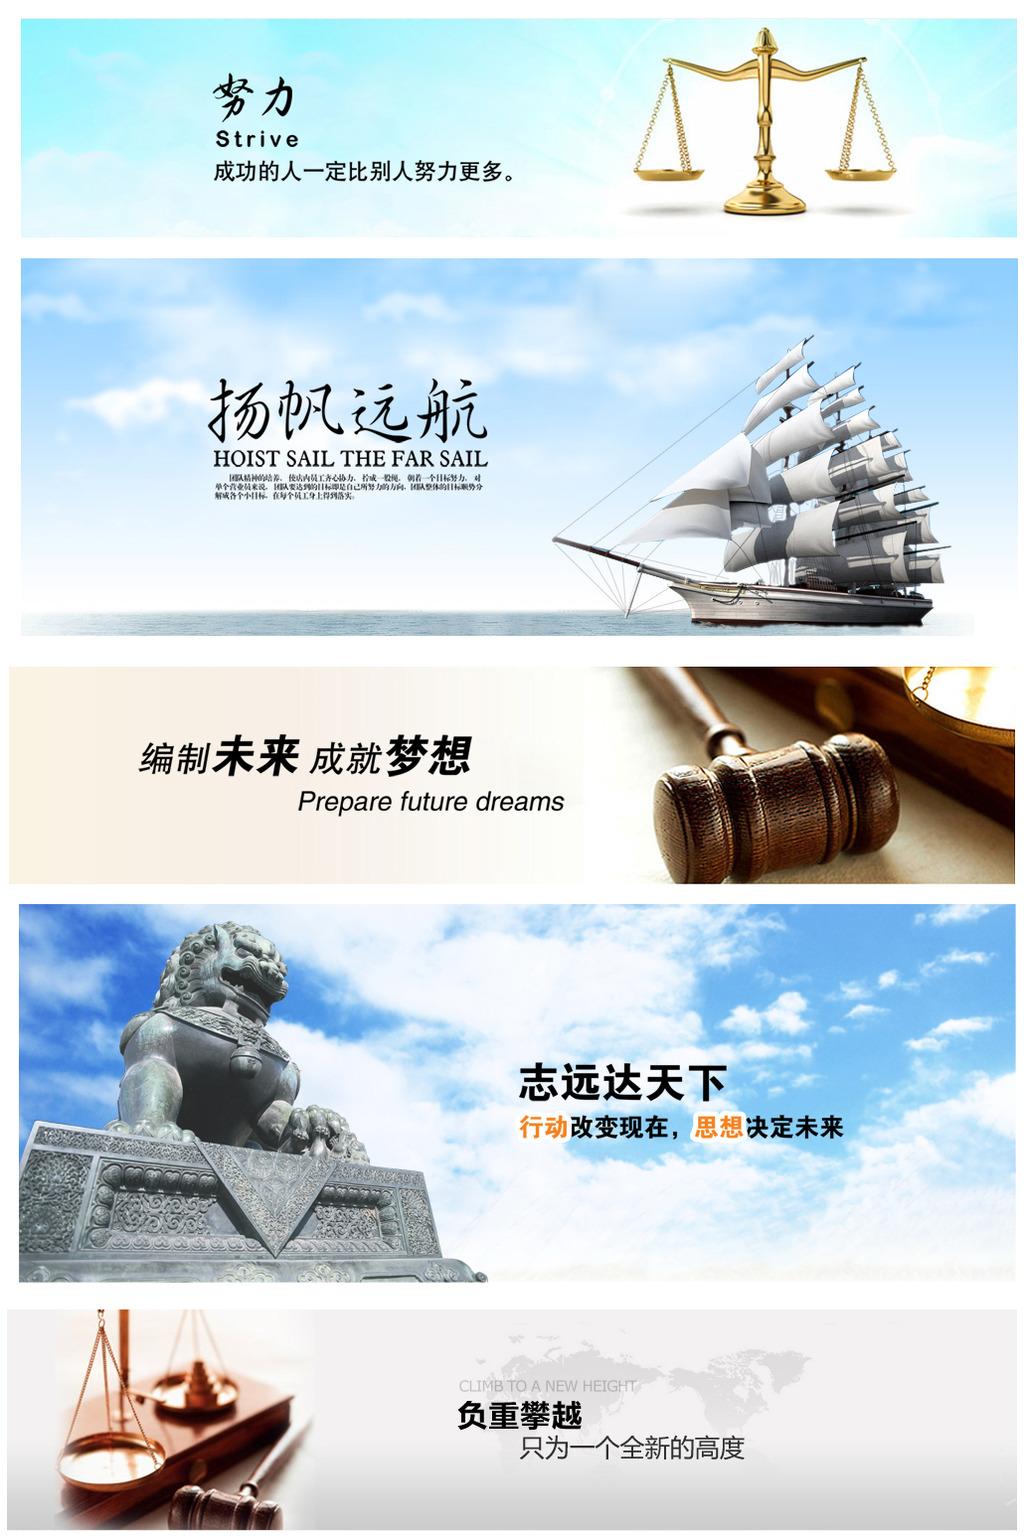 ui设计 网页设计模板 网站banner|网站广告条 > banner企业集团网站横